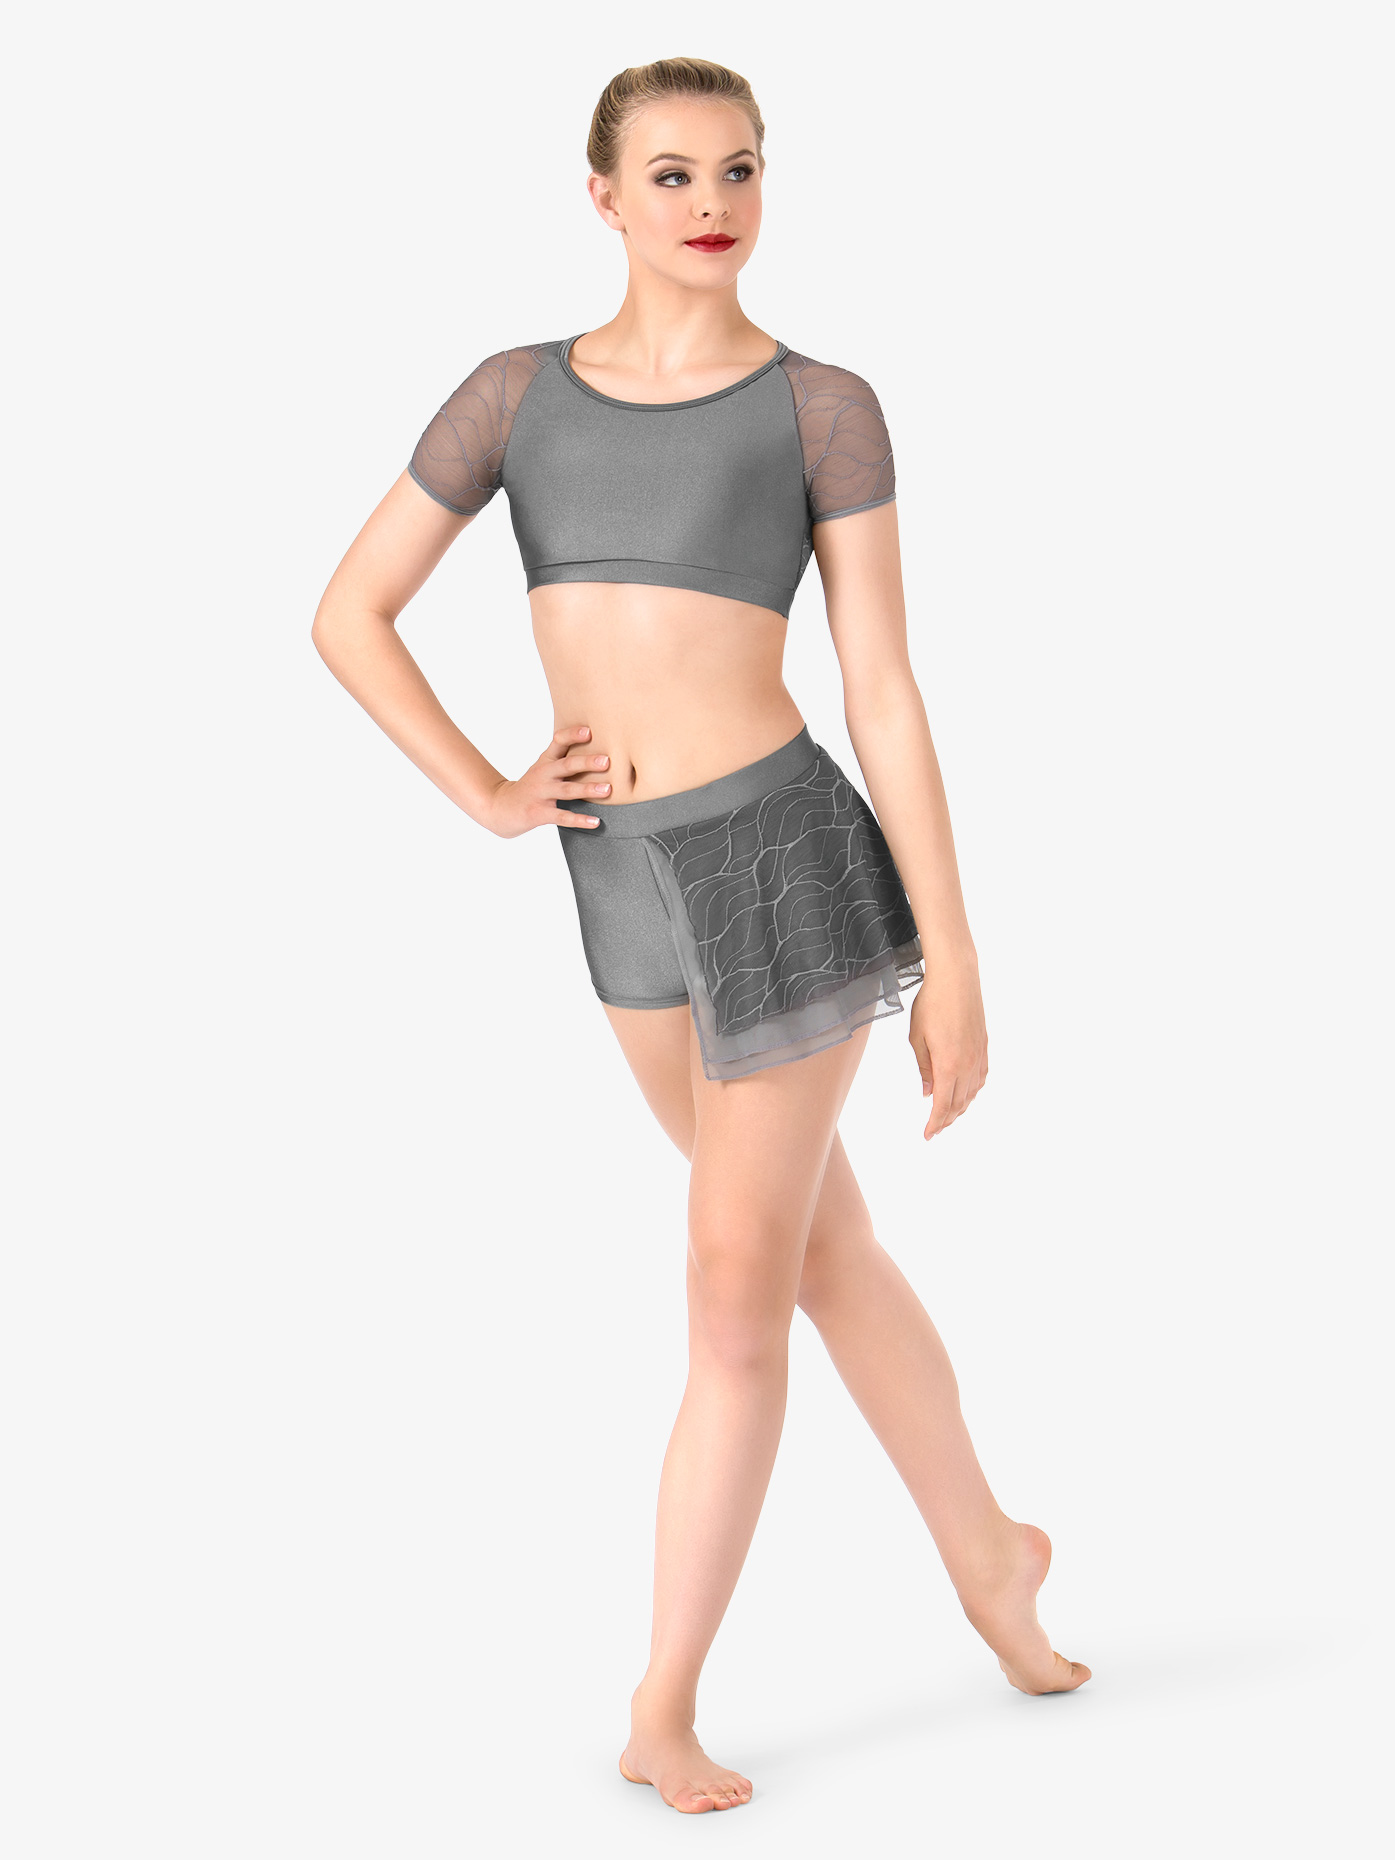 Double Platinum Womens Swirl Mesh Bustled Dance Shorts N7633